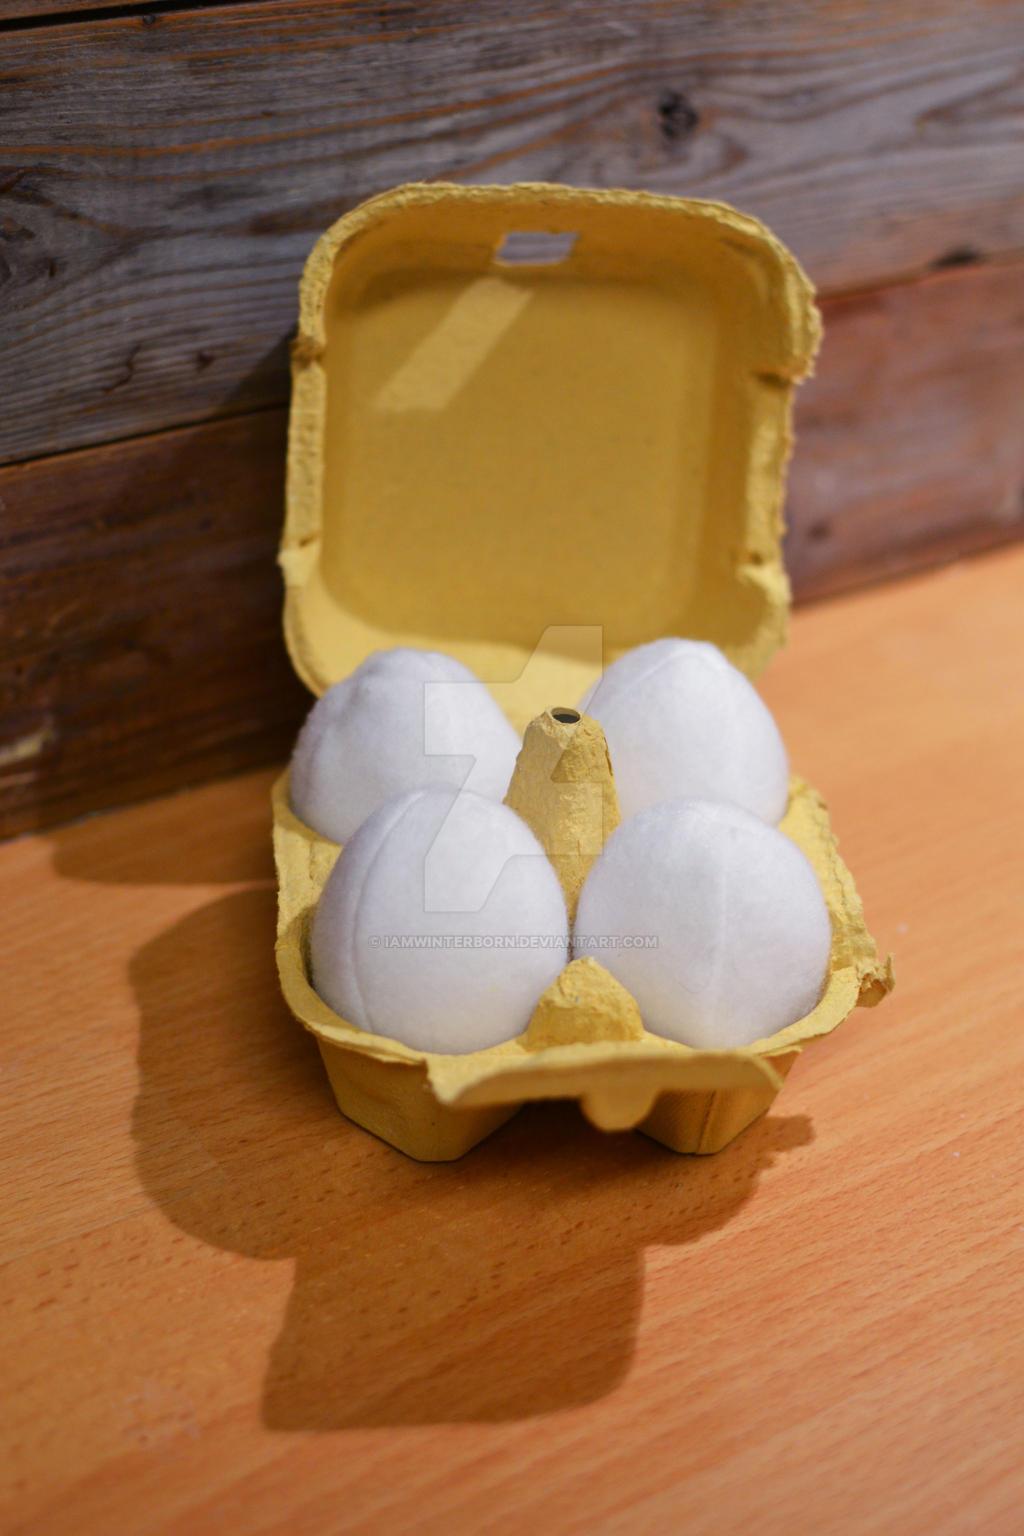 Eggs by iamwinterborn